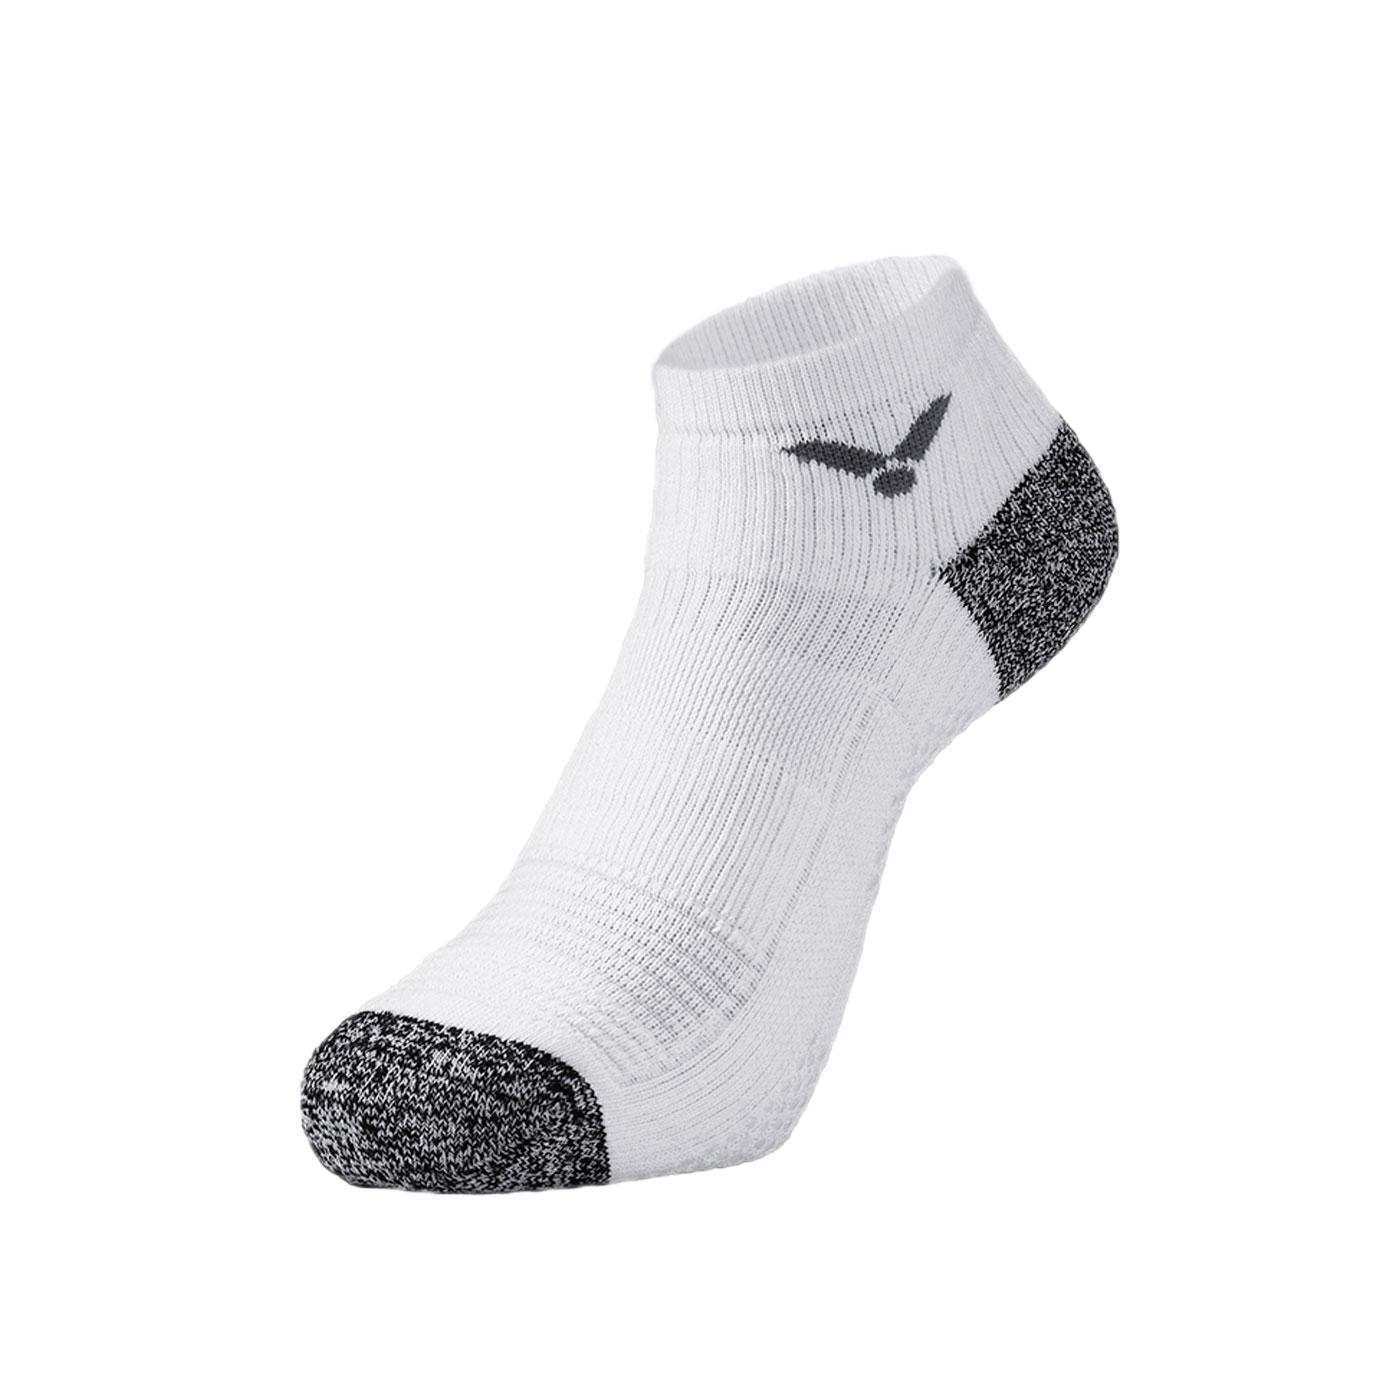 VICTOR 抗菌消臭機能襪 C-5079A - 白灰黑